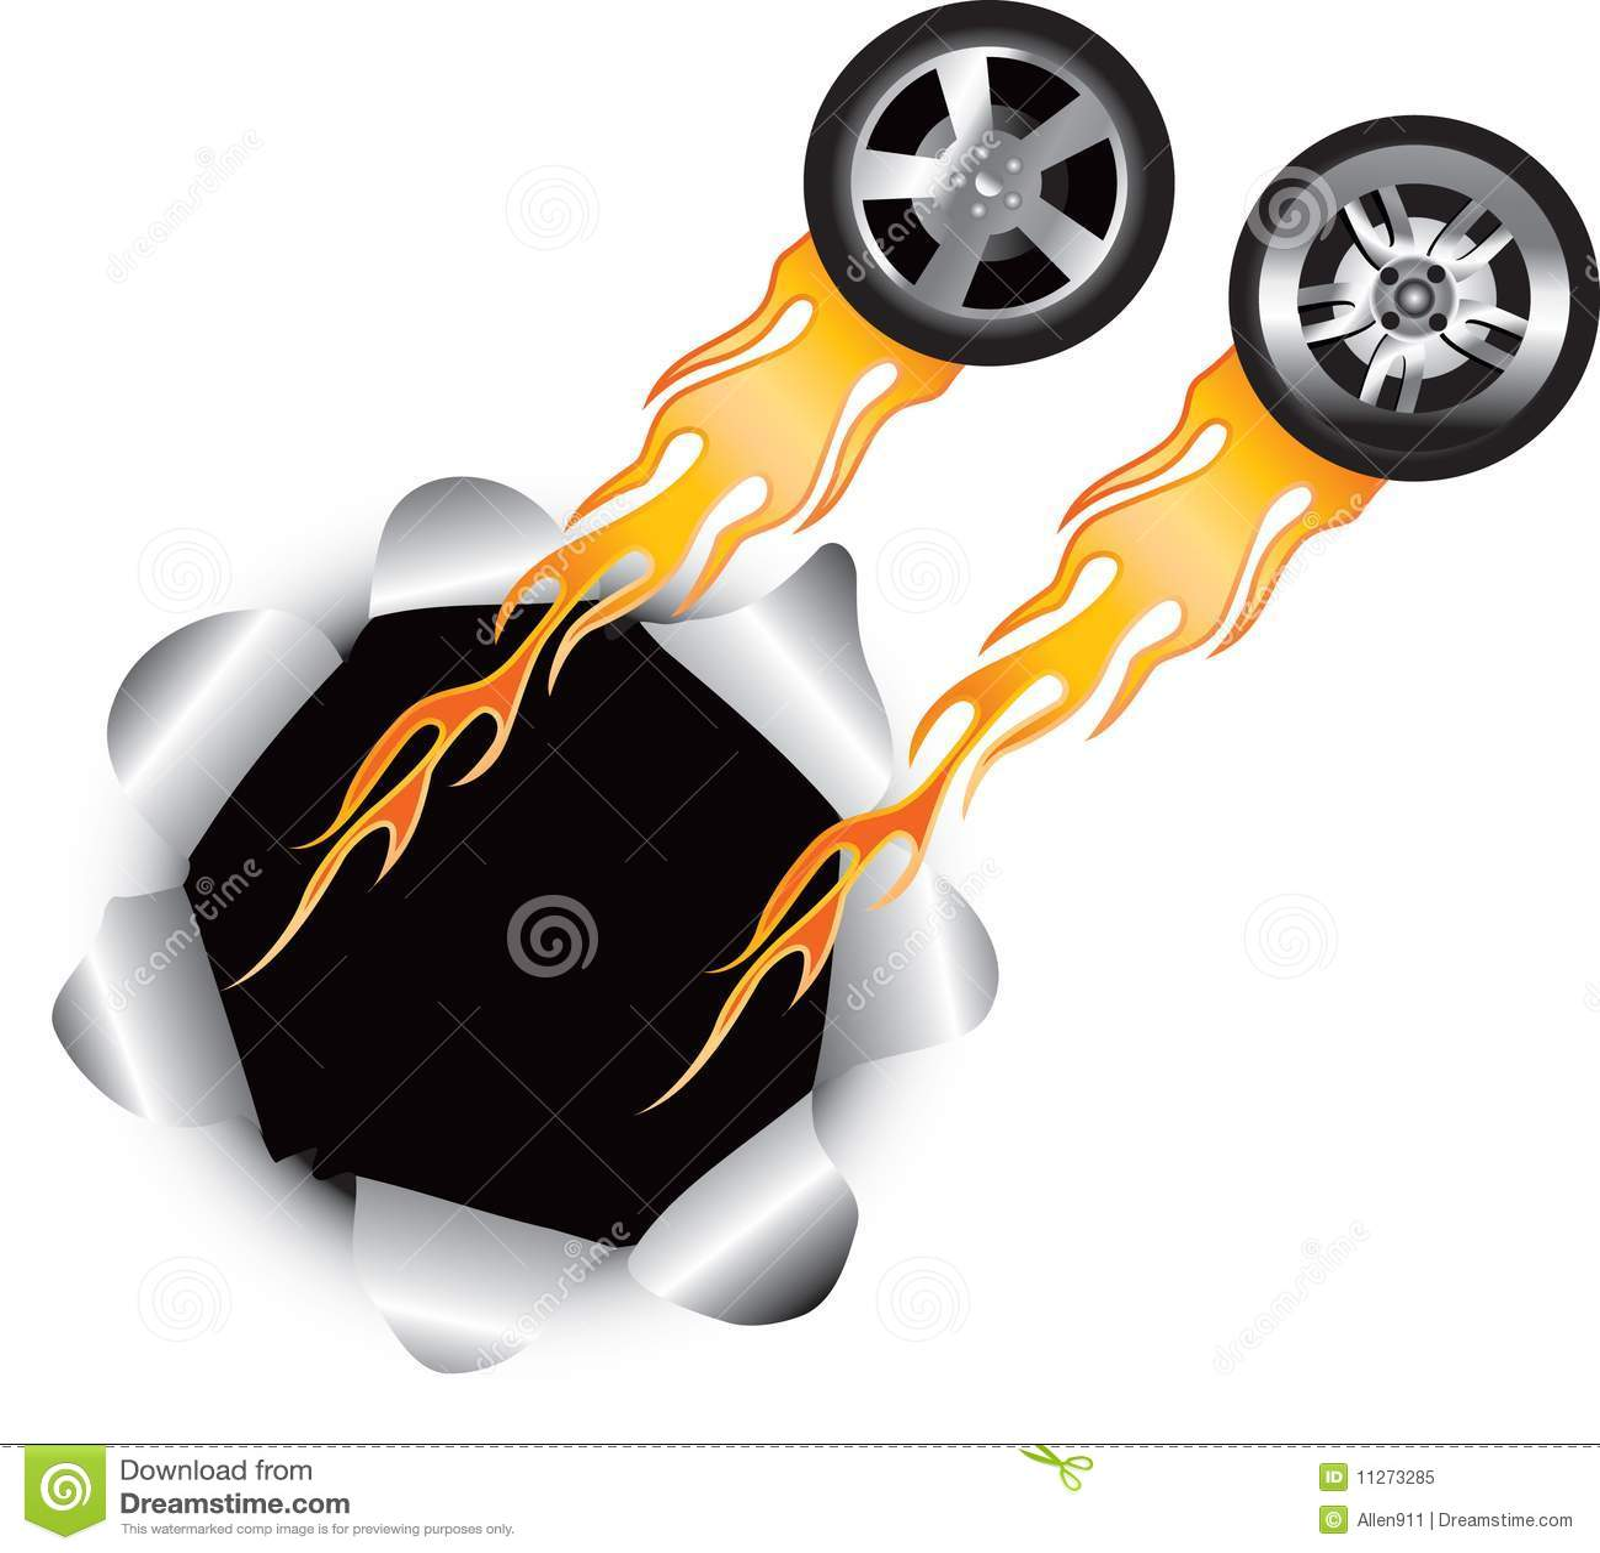 Burning Tires As Renewable Energy? | Atlas Bear |Flamming Tire